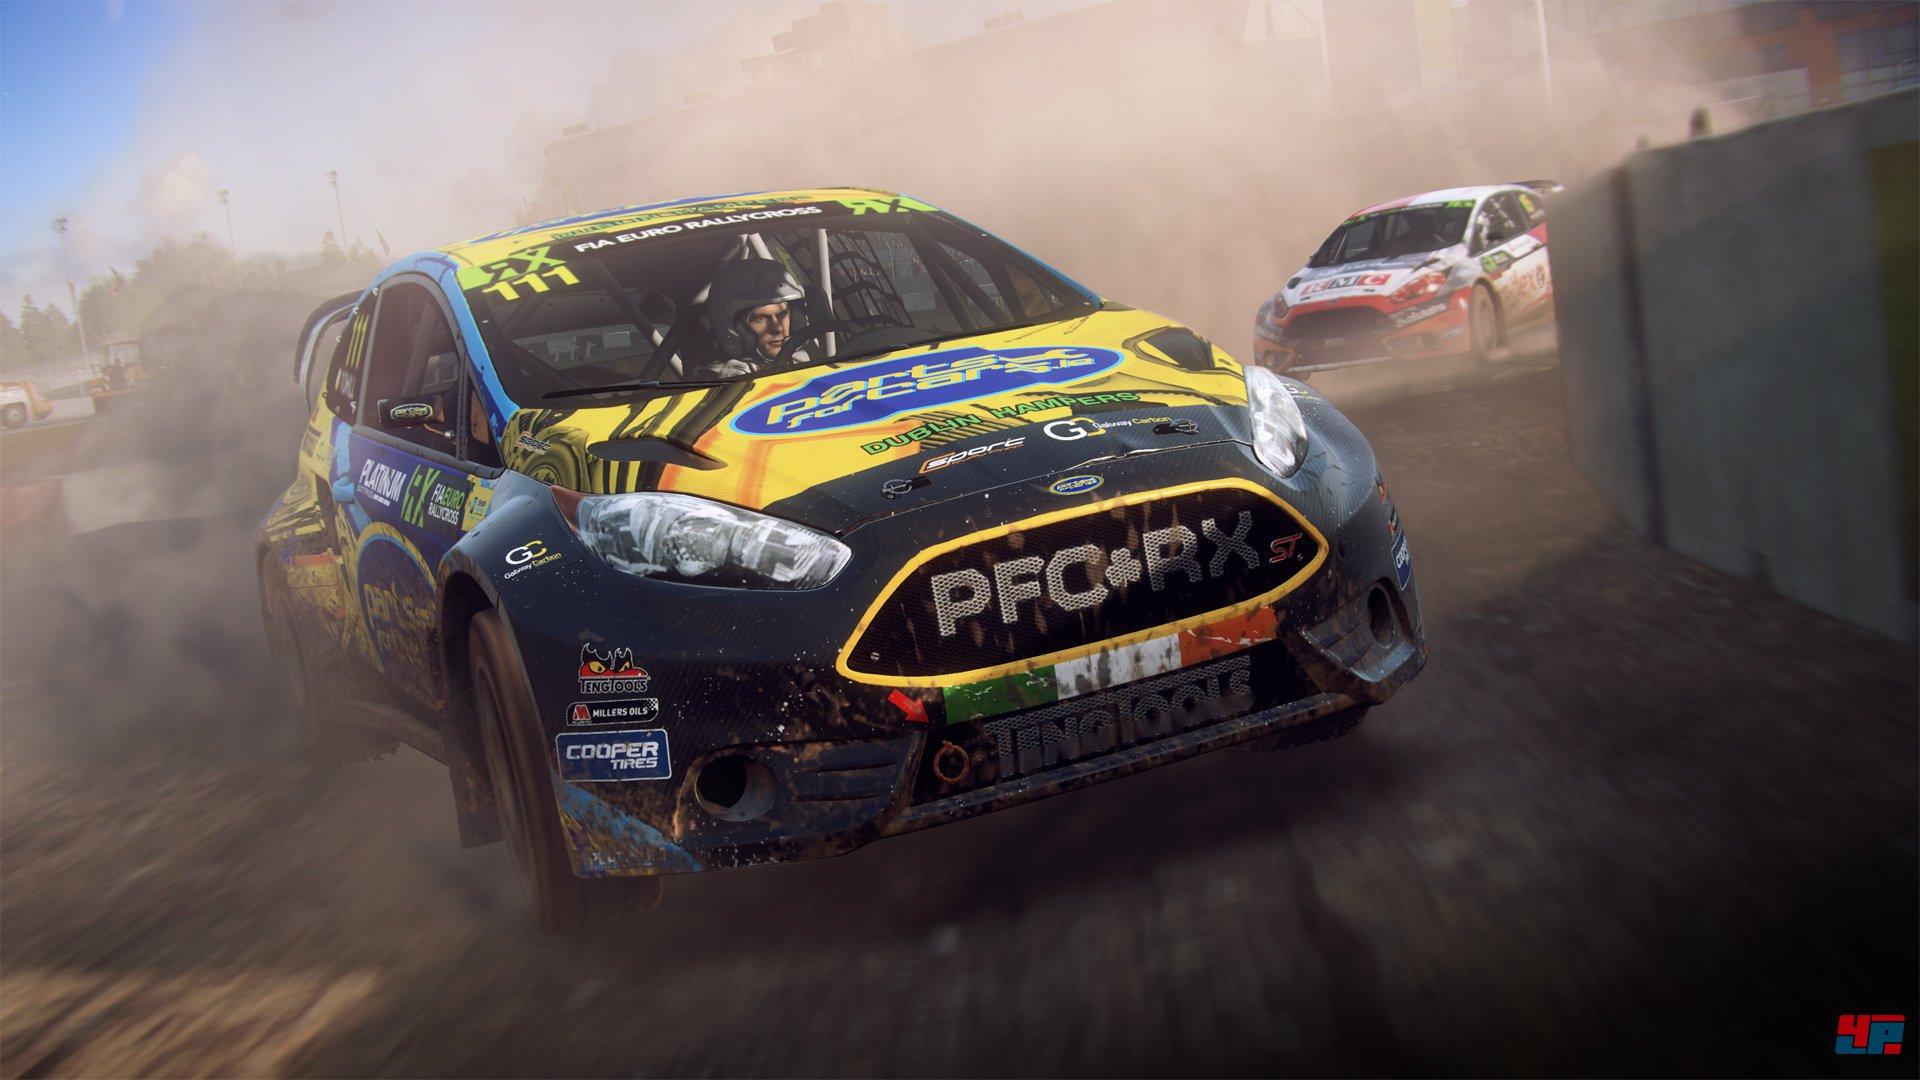 DiRT Rally 2 0 Rallye Rennspiel angekündigt Simulationswurzeln des